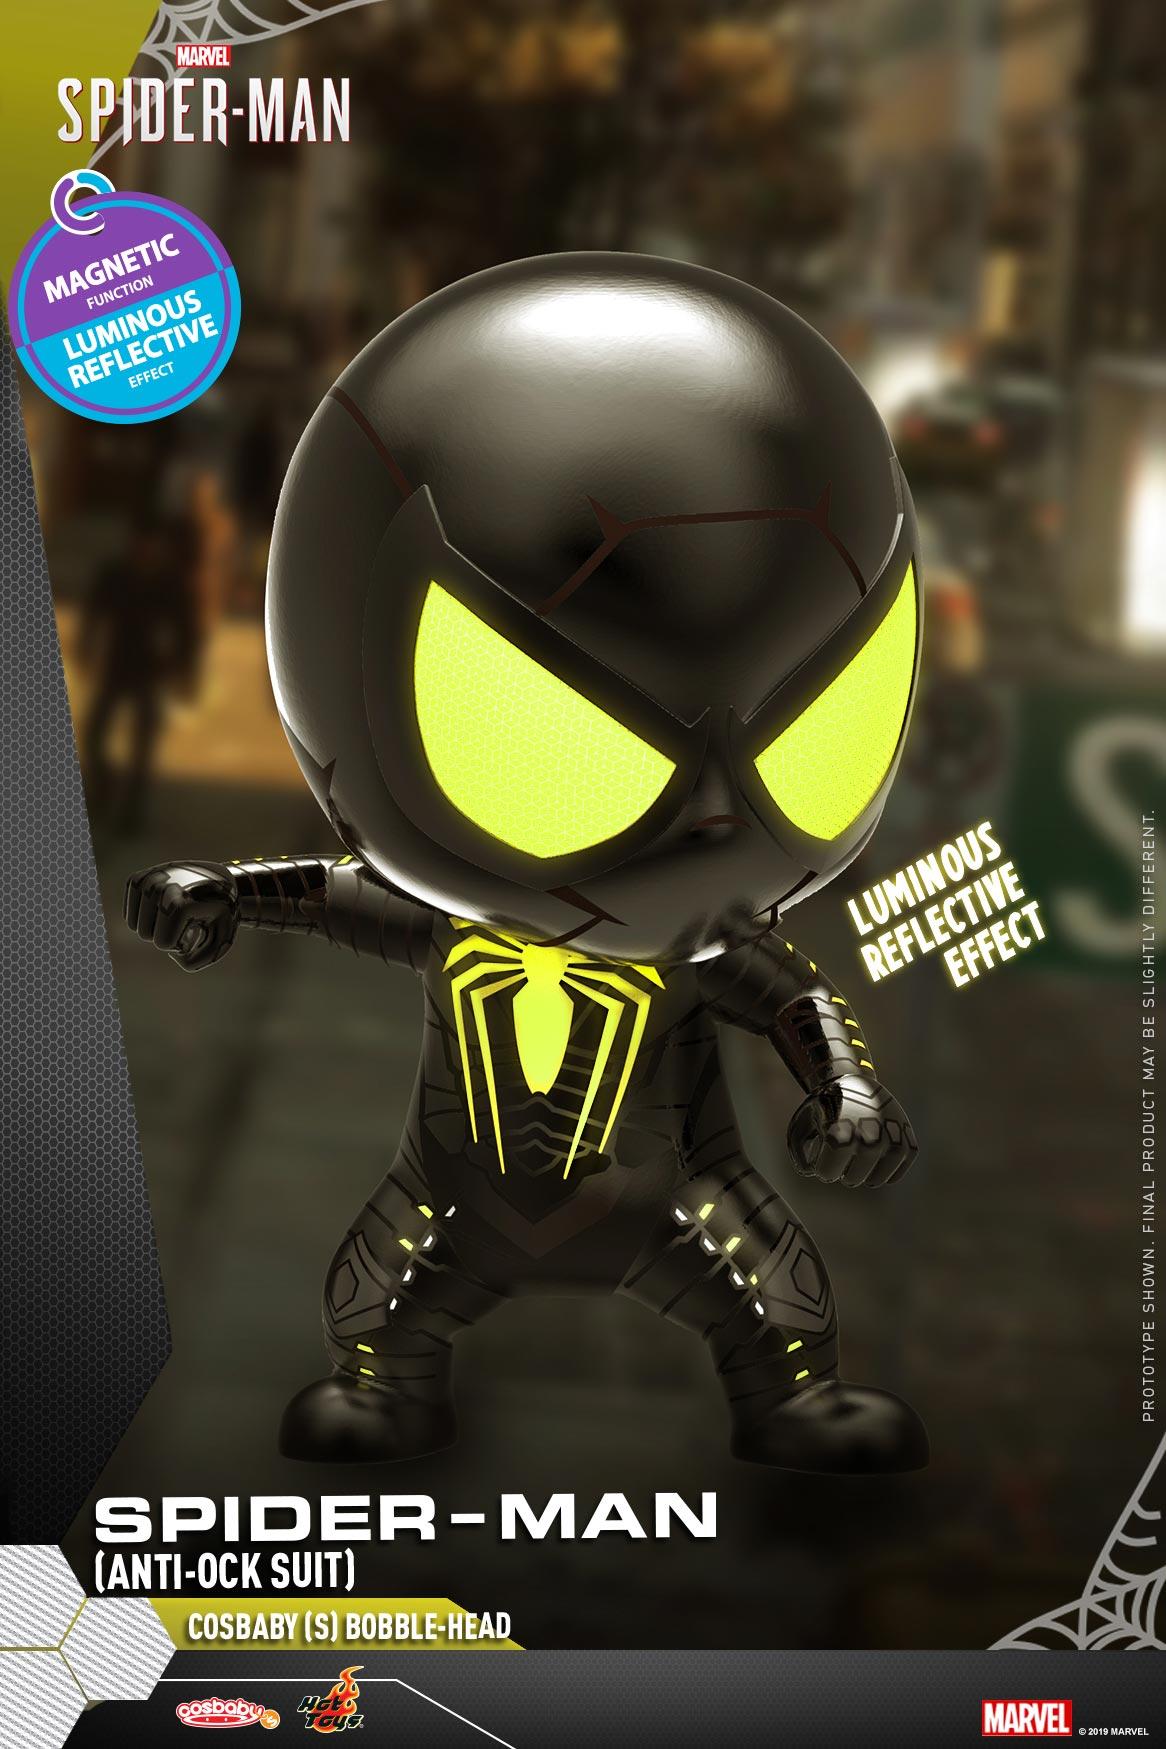 Hot-Toys---Marvel-Spider-Man---Spider-Man-(Anti-Ock-Suit)-Cosbaby-(S)_PR2